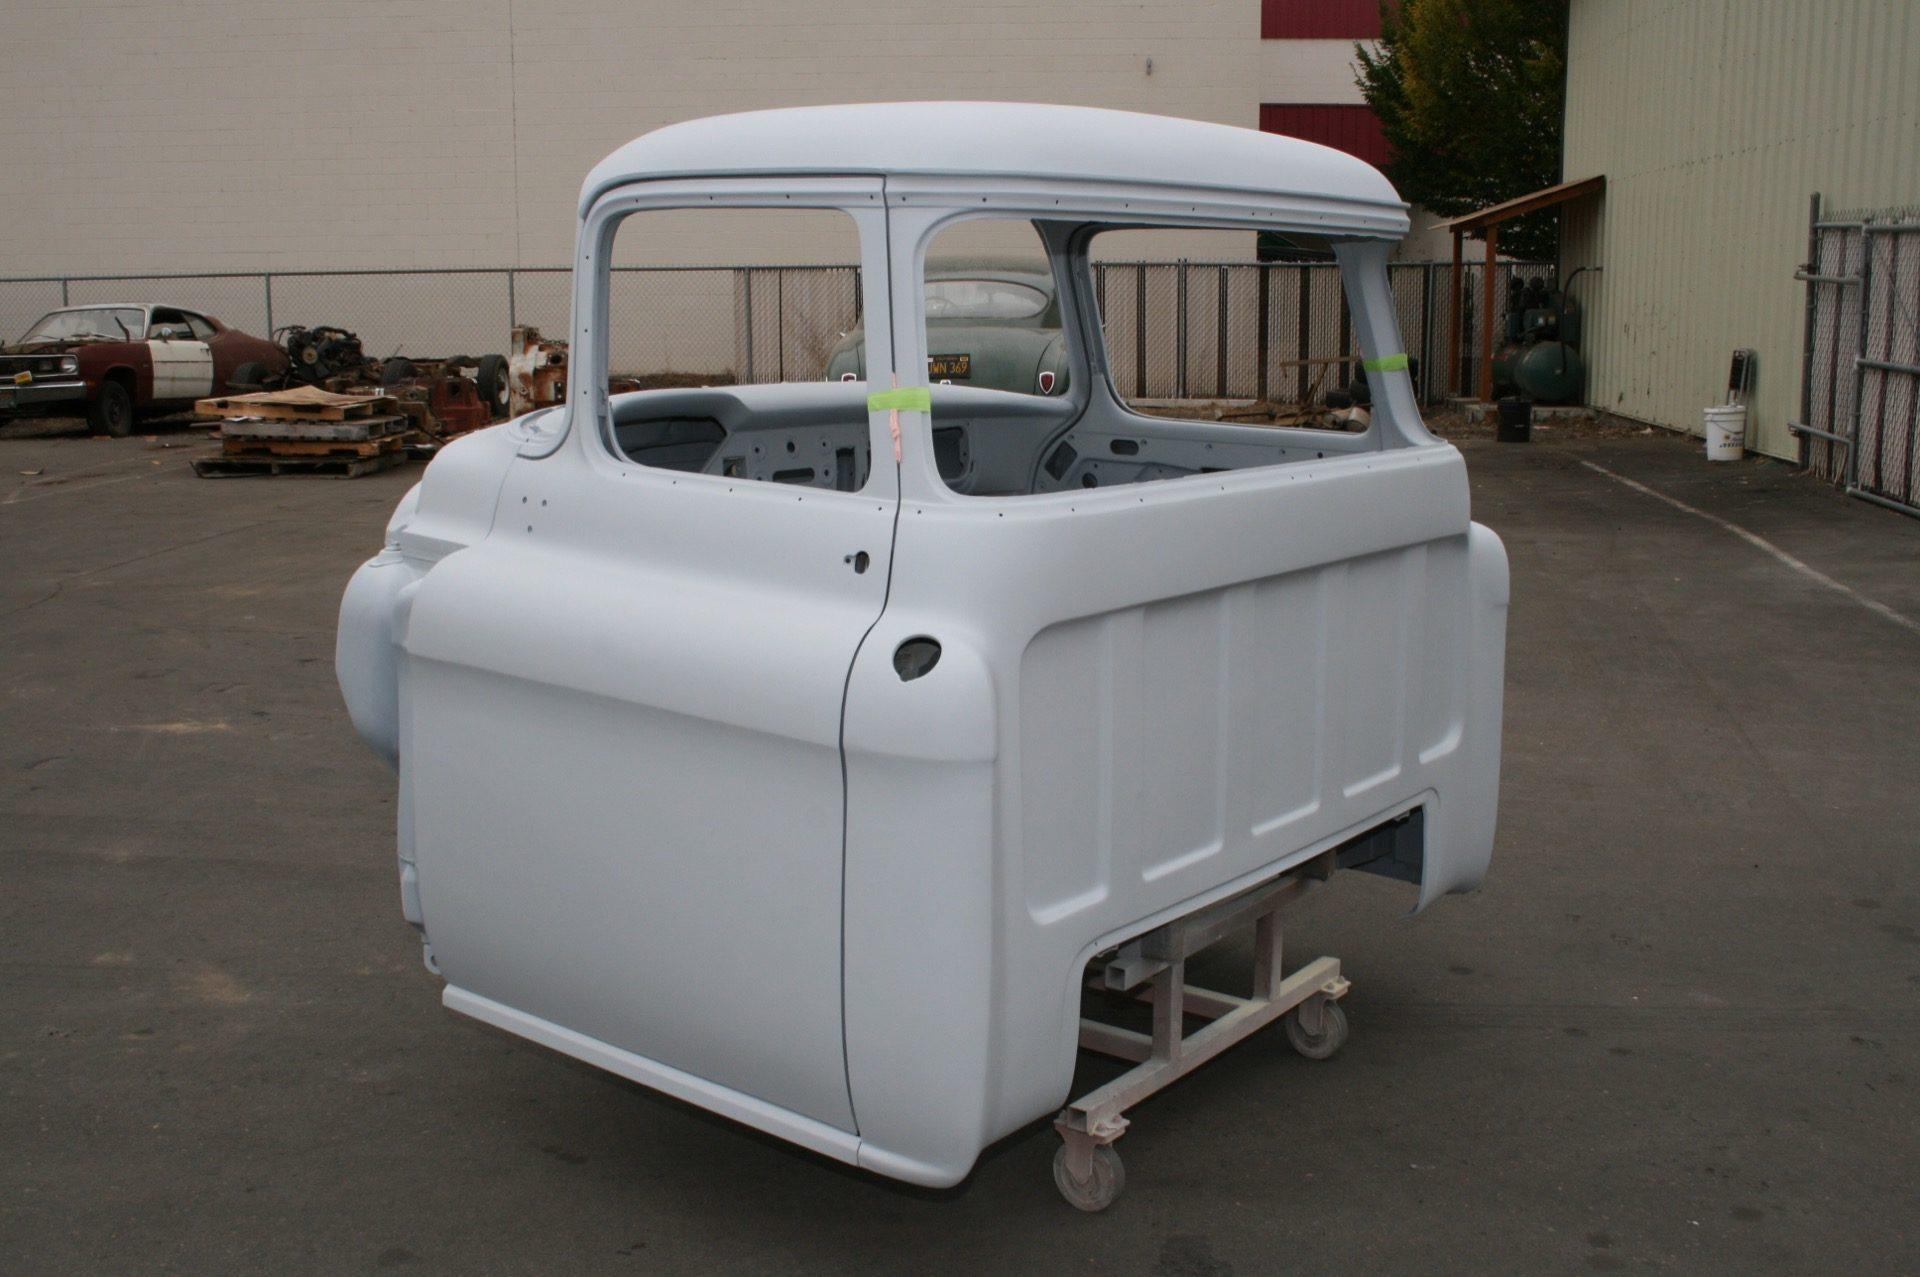 1958 Chevy Pickup Metalworks Classics Auto Restoration Speed Shop Metalworks Classic Auto Restoration Speed Shop